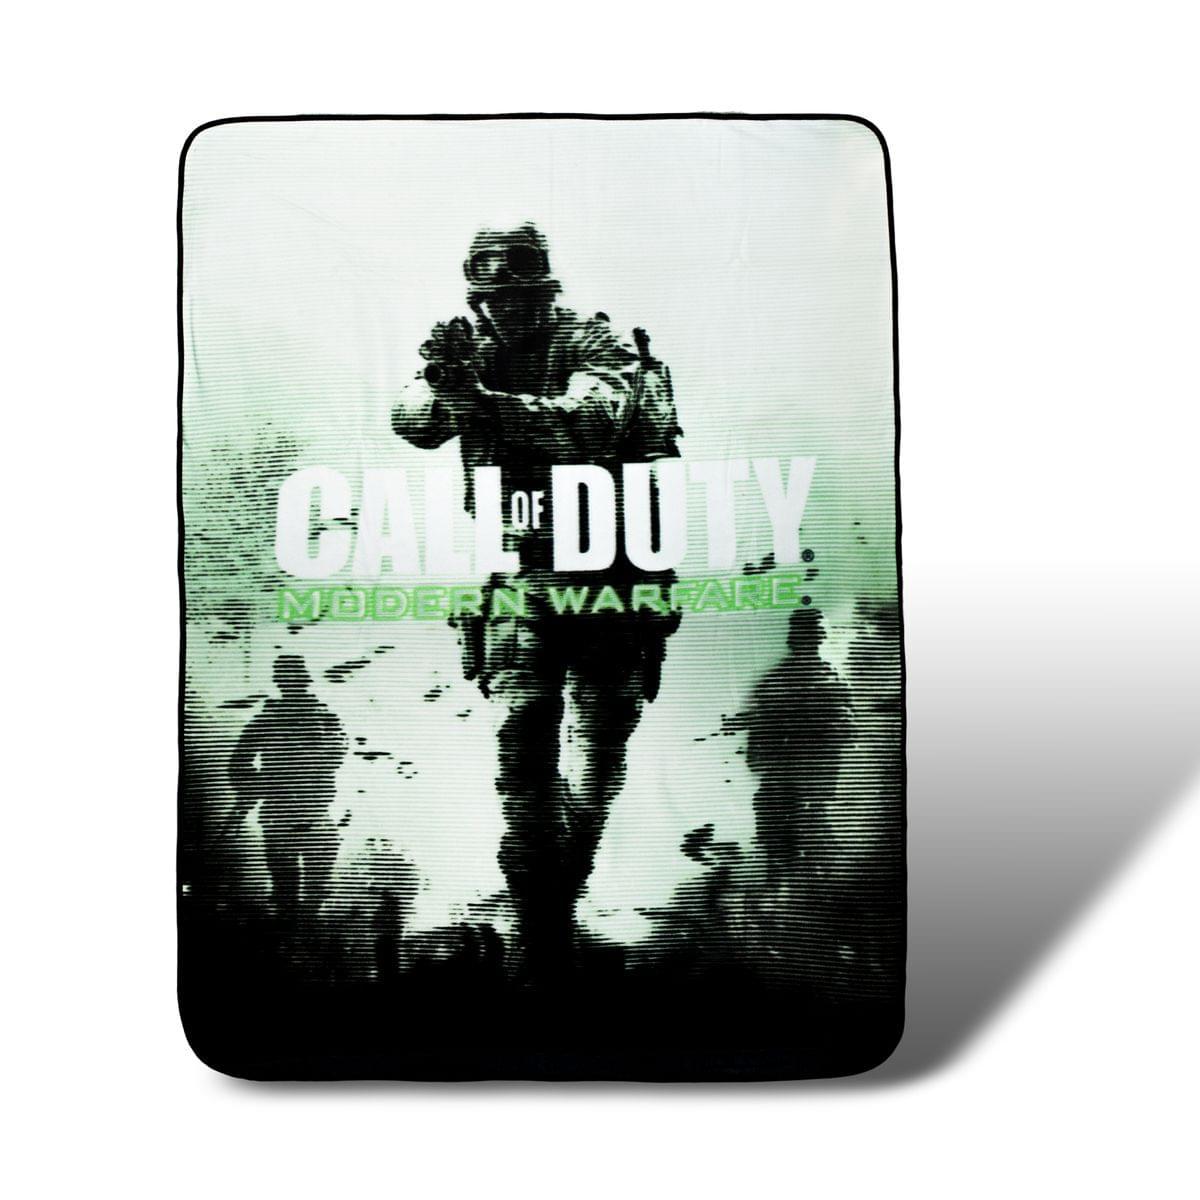 Call of Duty Lightweight Fleece Throw Blanket | 45 x 60 Inches